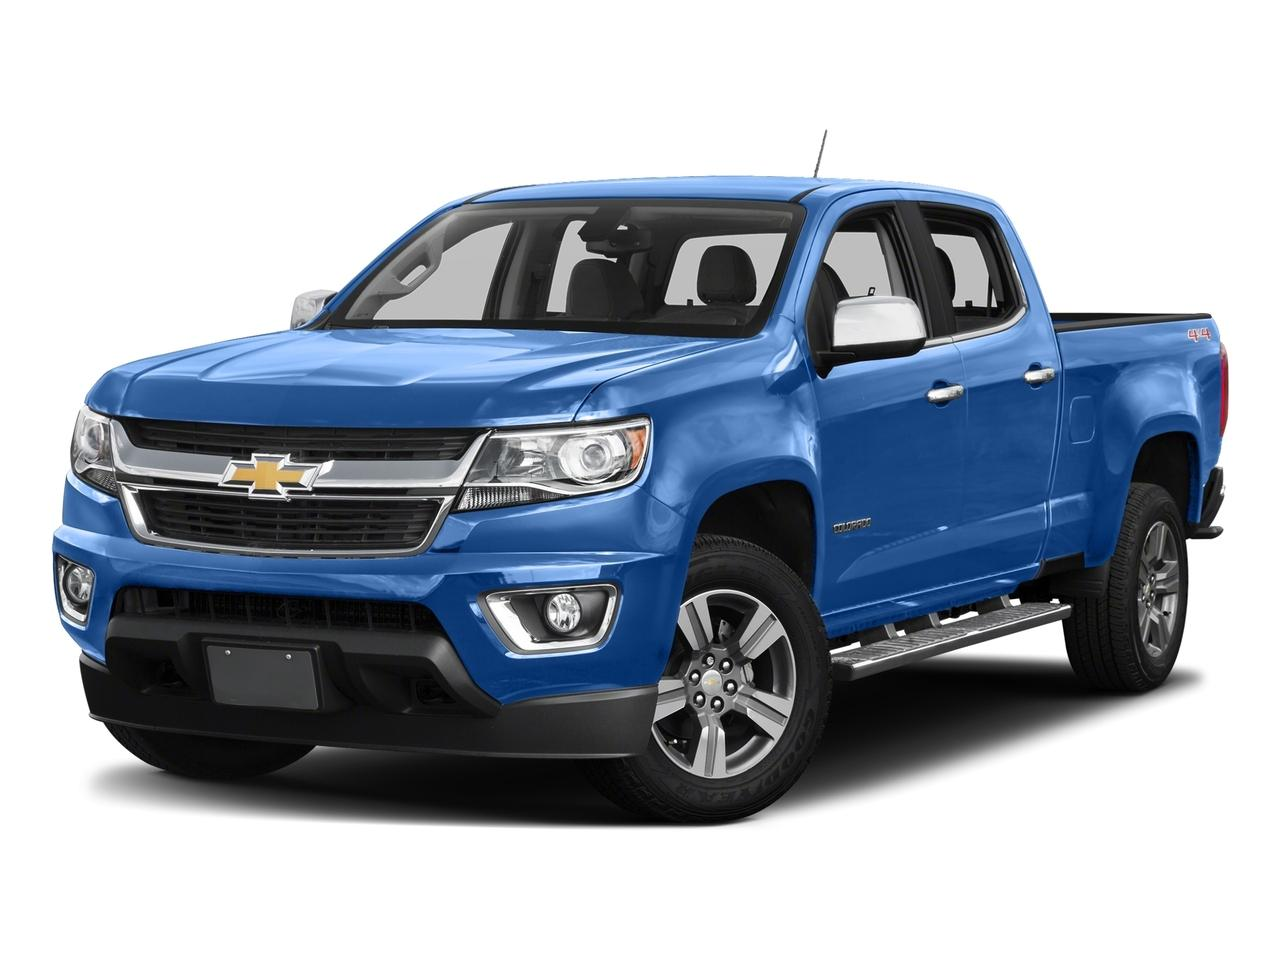 2018 Chevrolet Colorado Vehicle Photo in GARDNER, MA 01440-3110